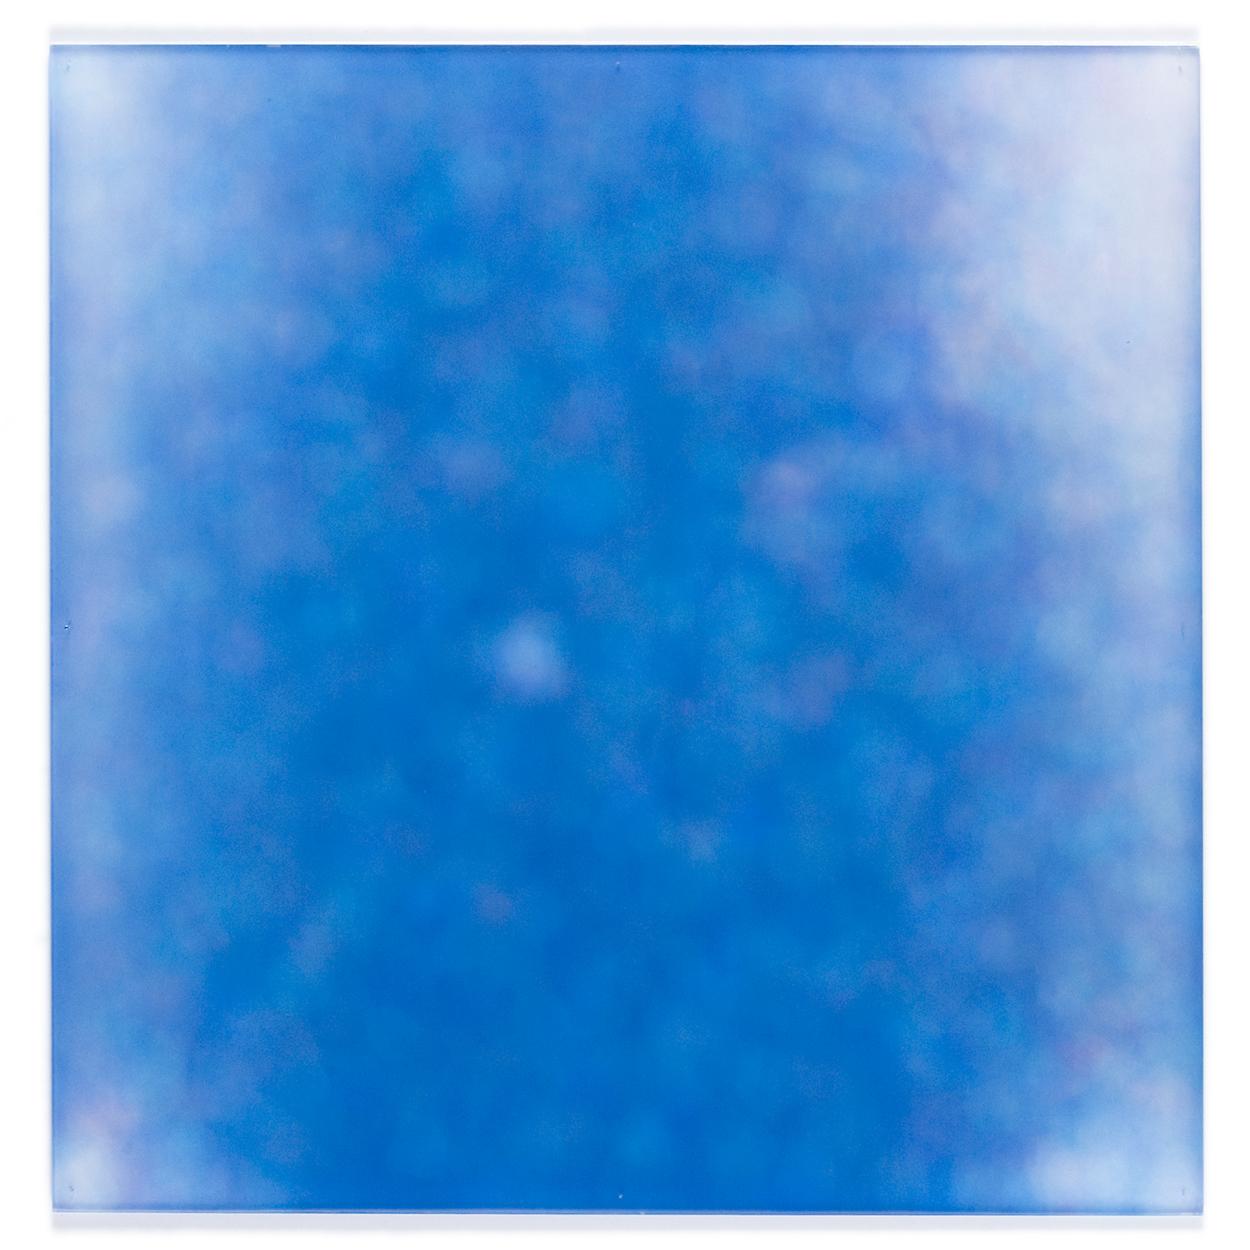 Irradiation|silkscreen on acrylic fiber plate|600 x 600 x 5 mm|2010